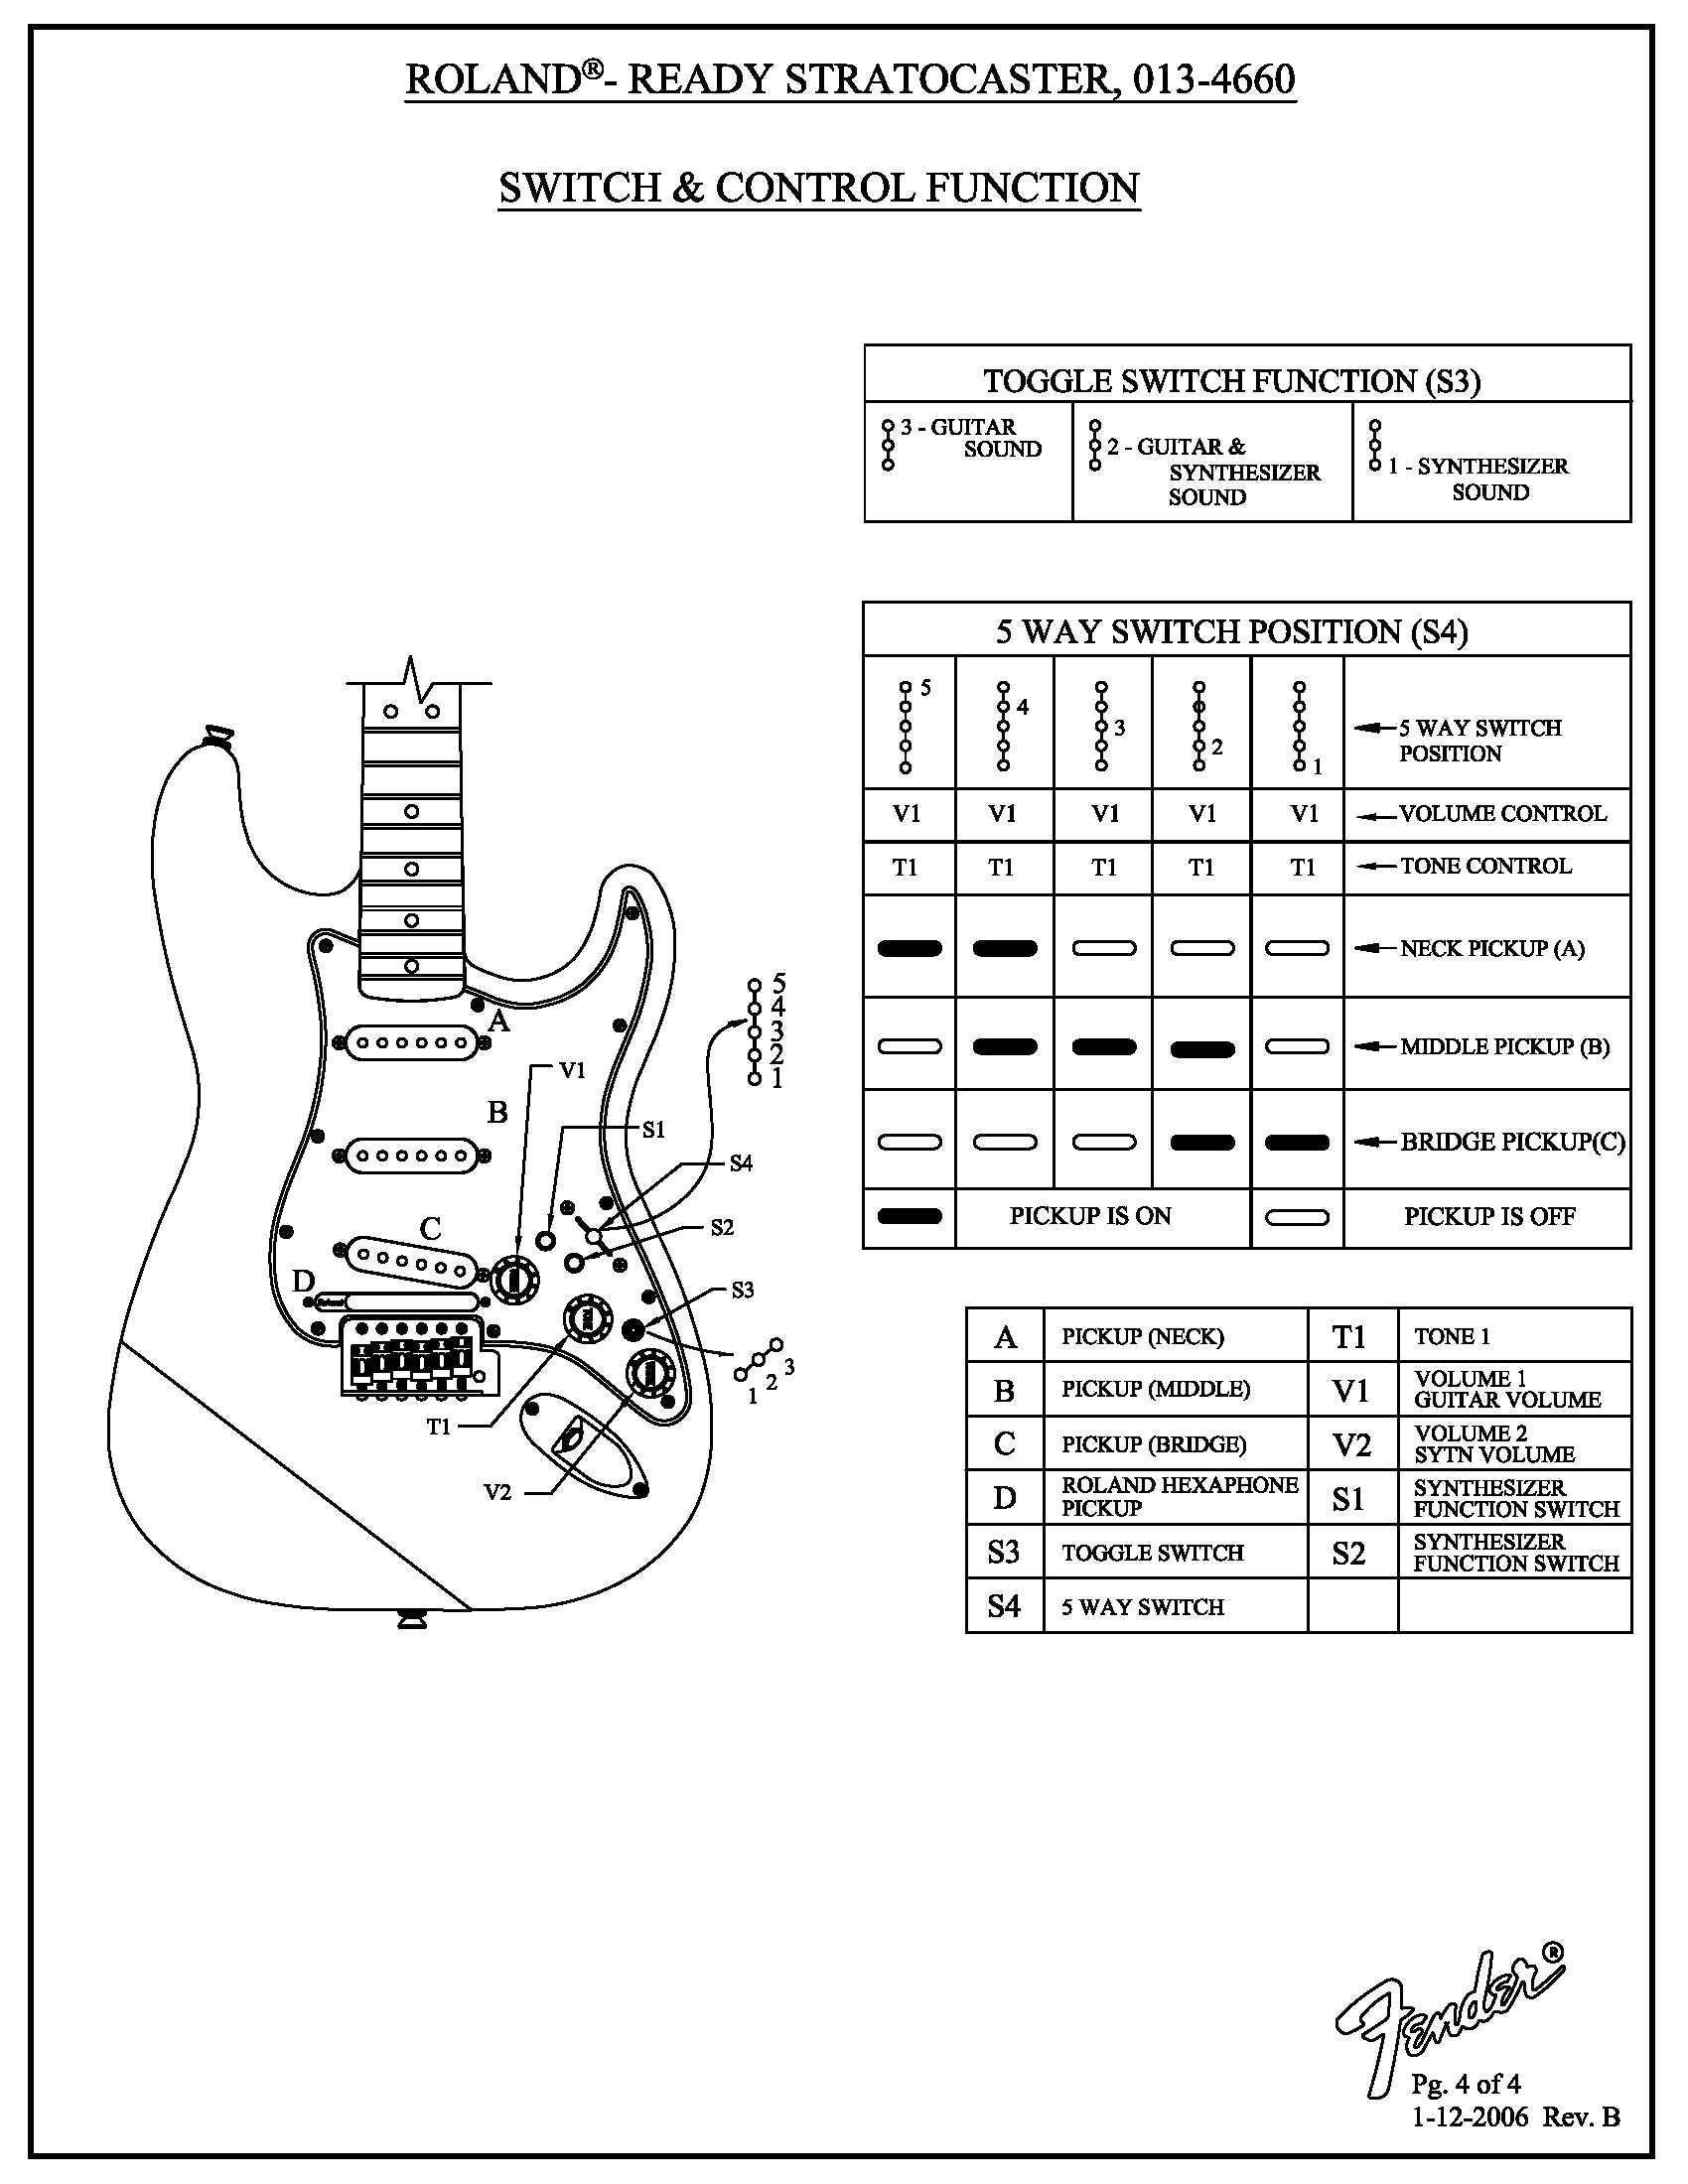 Standard Roland Stratocaster Service Manual 013466